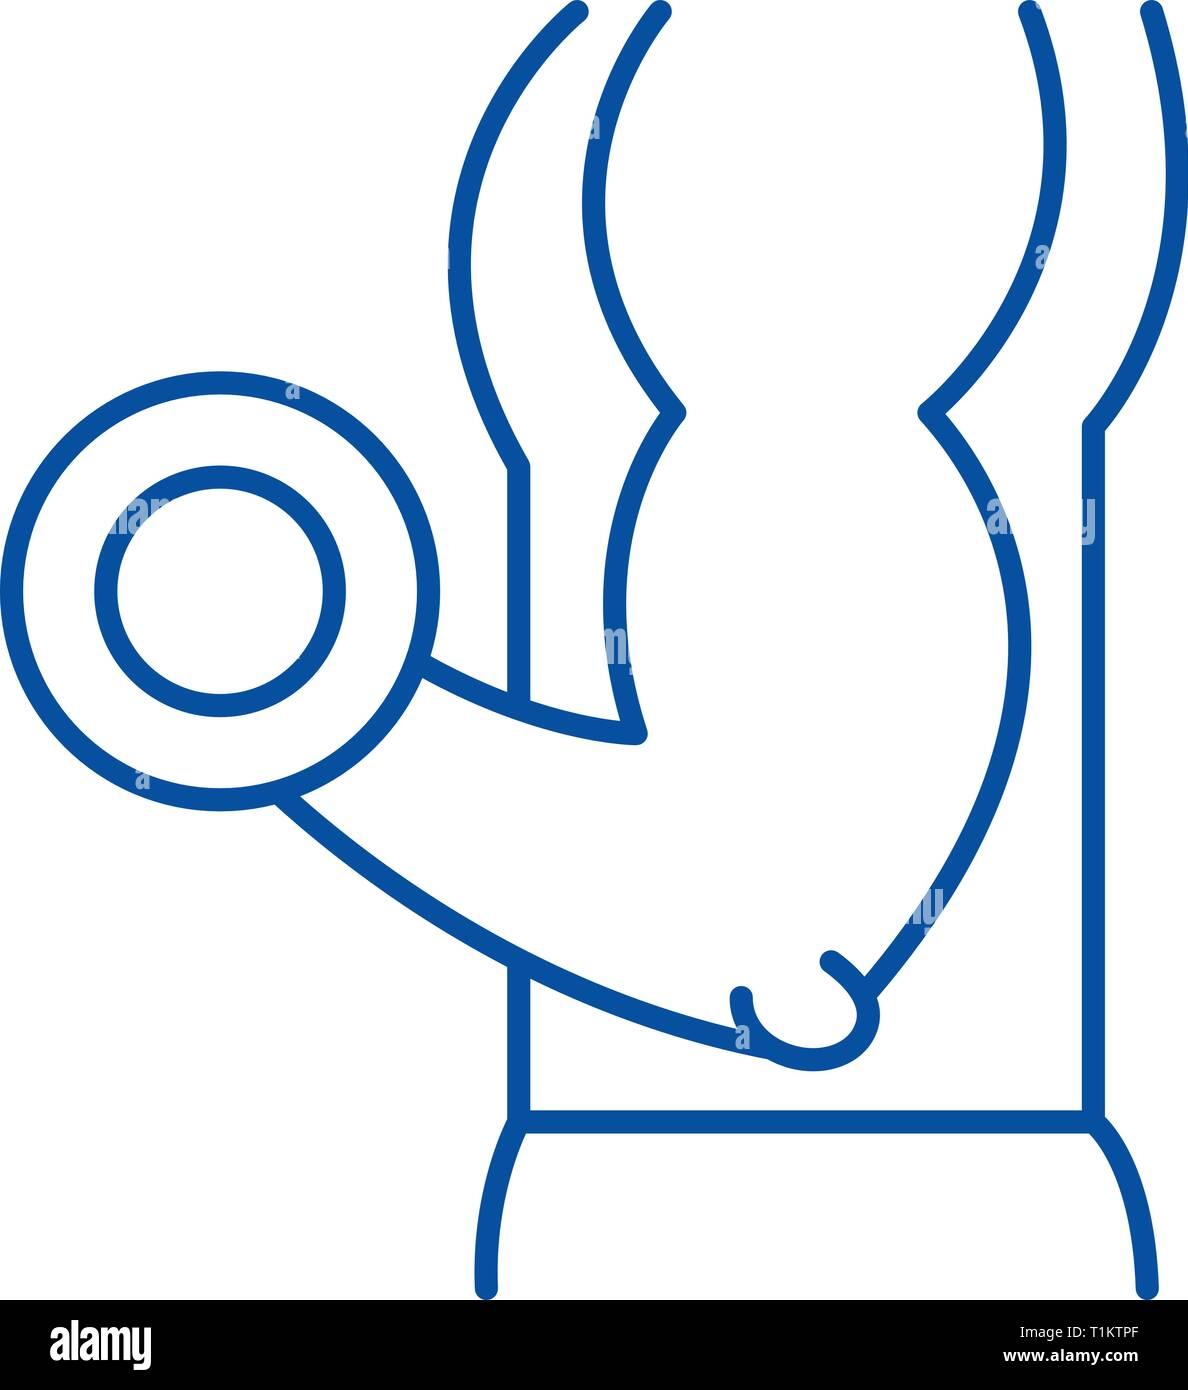 Physical Strength: Symbol Of Physical Strength Stock Photos & Symbol Of